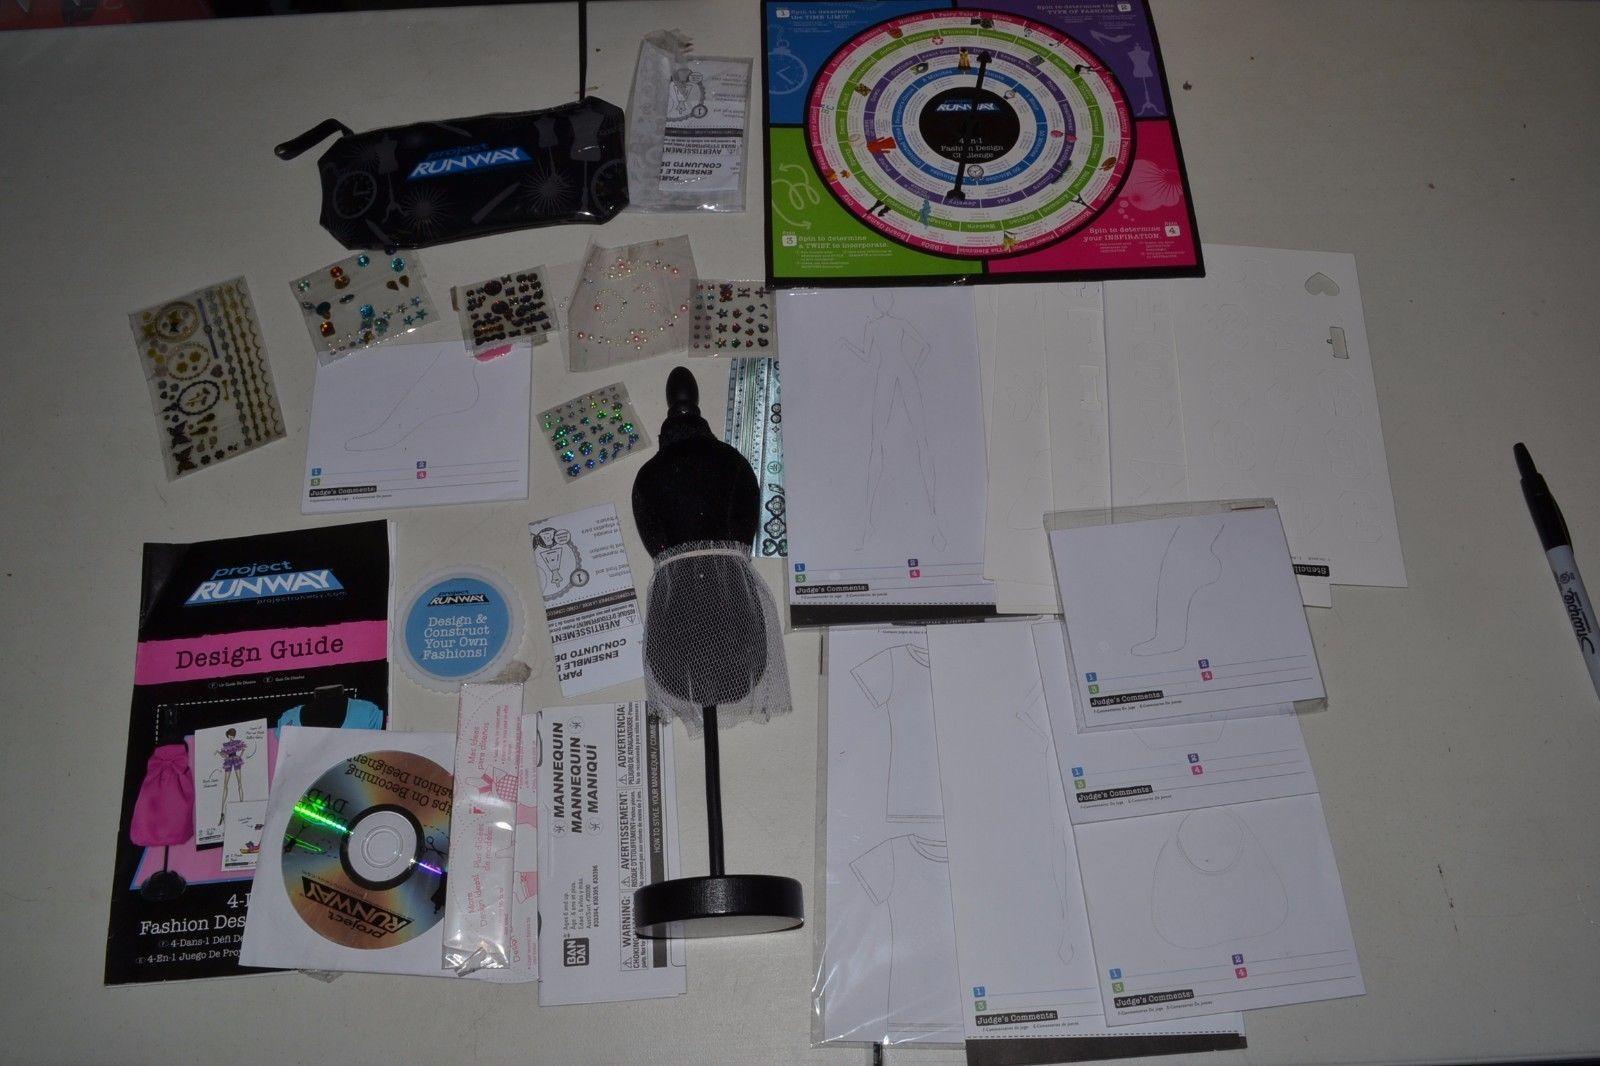 Project Runway Accessory Design Challenge Sketch Book Set Fashion Adch Ebay Design Challenges Accessories Design Sketch Book